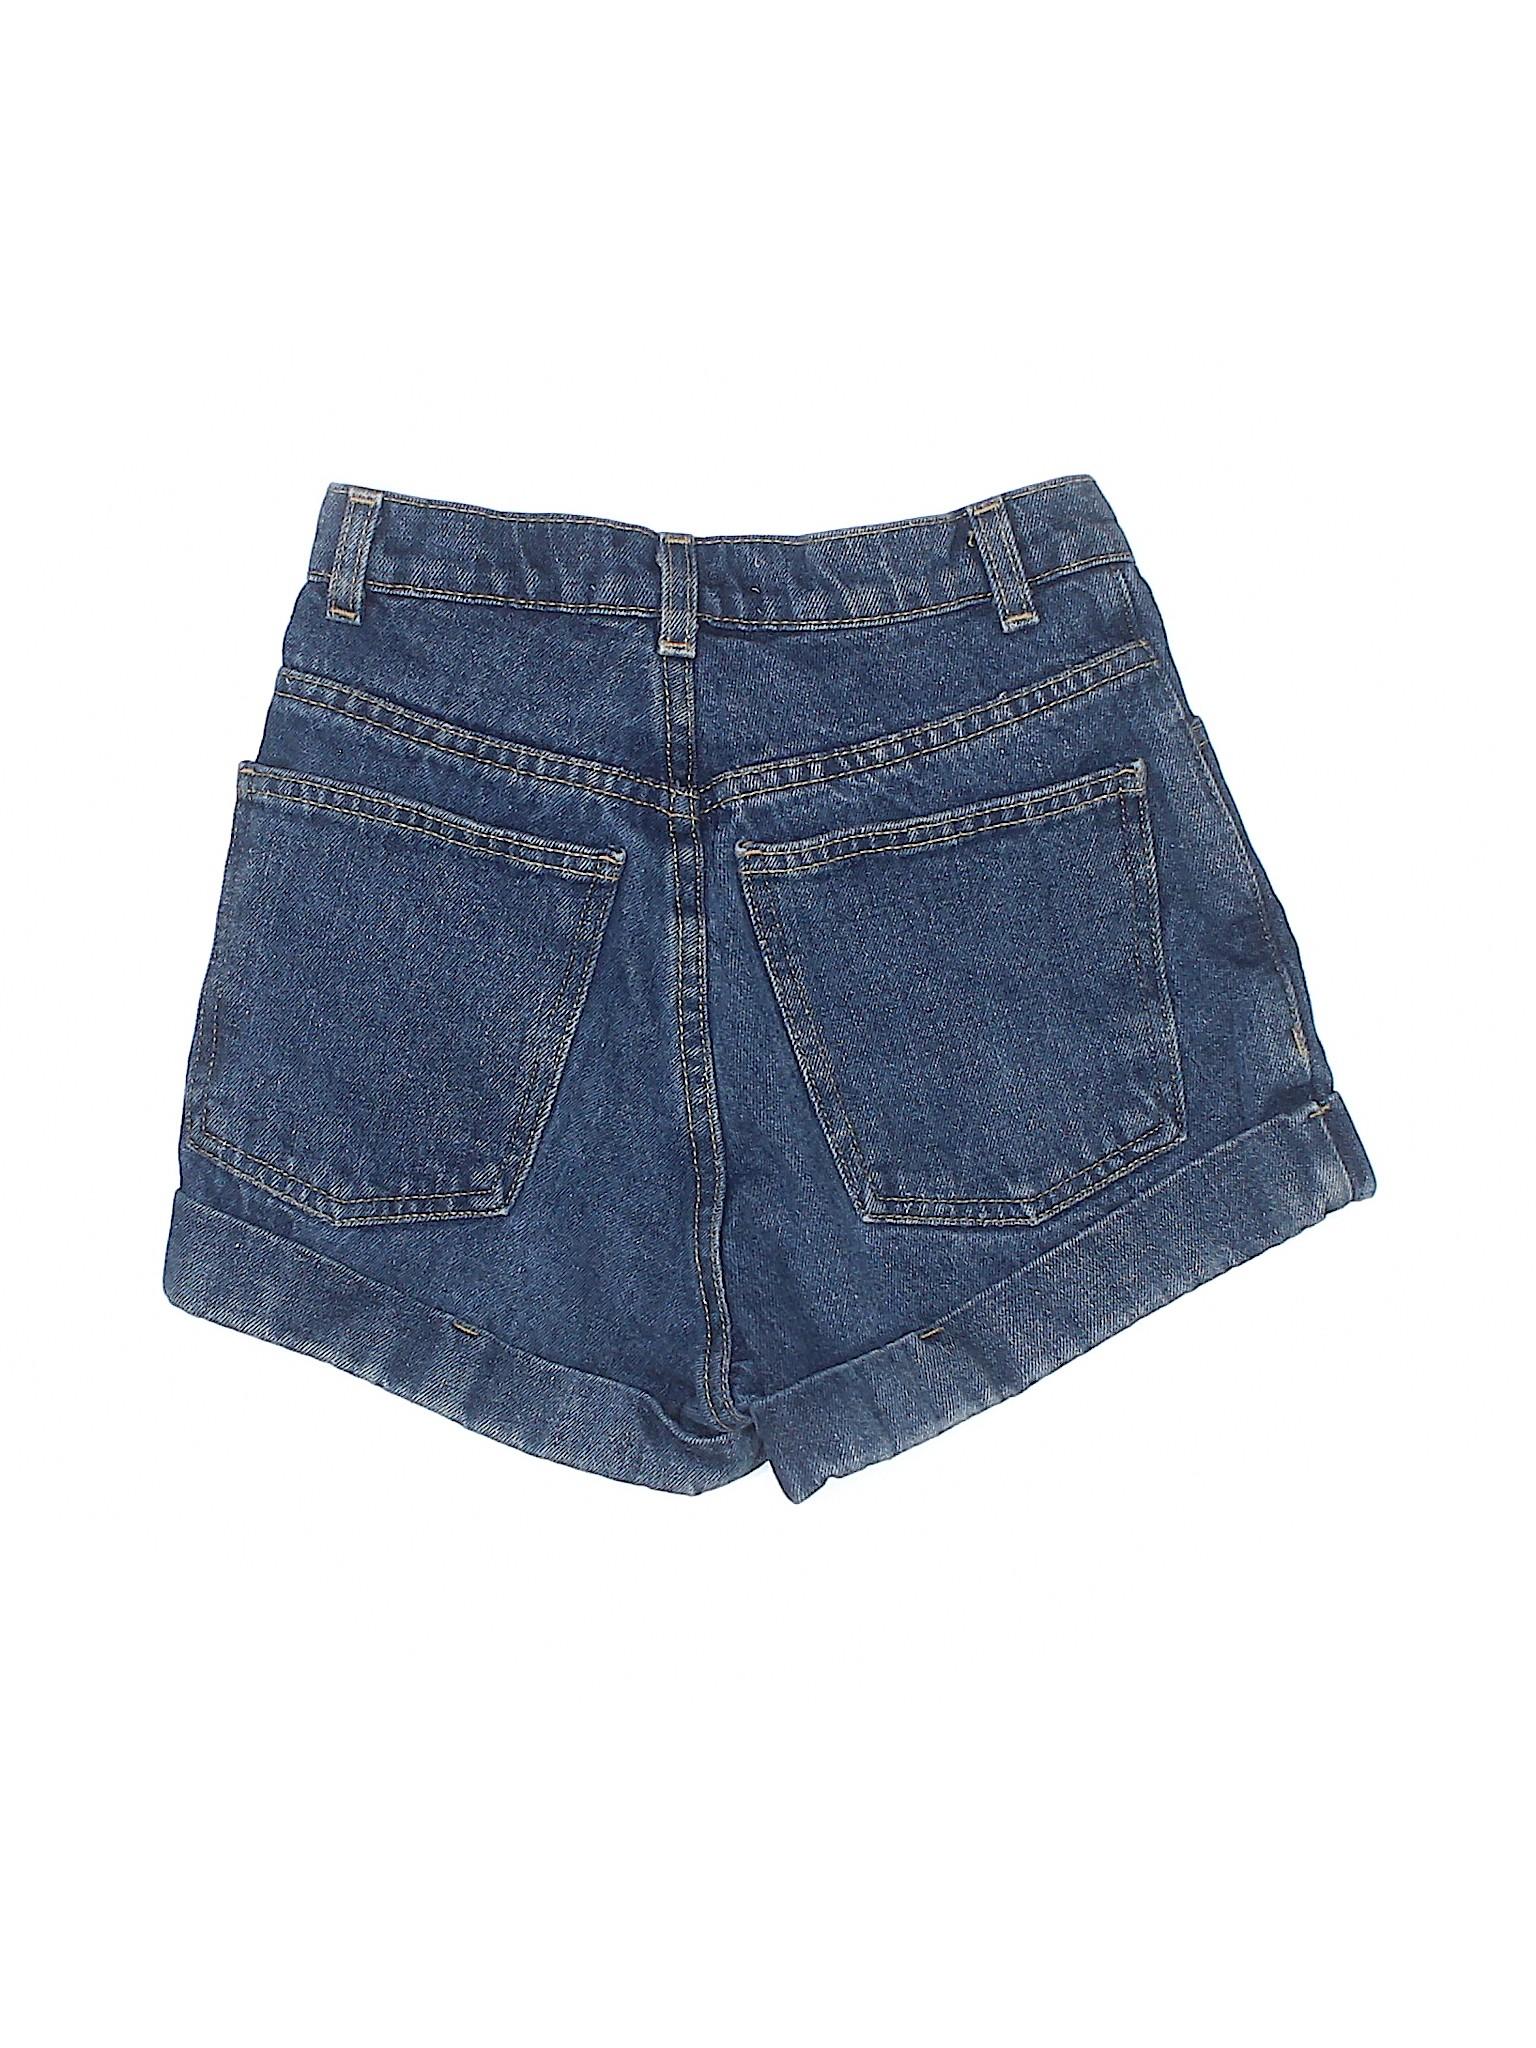 Apparel American Shorts Denim Boutique winter 0XxBqwwAC